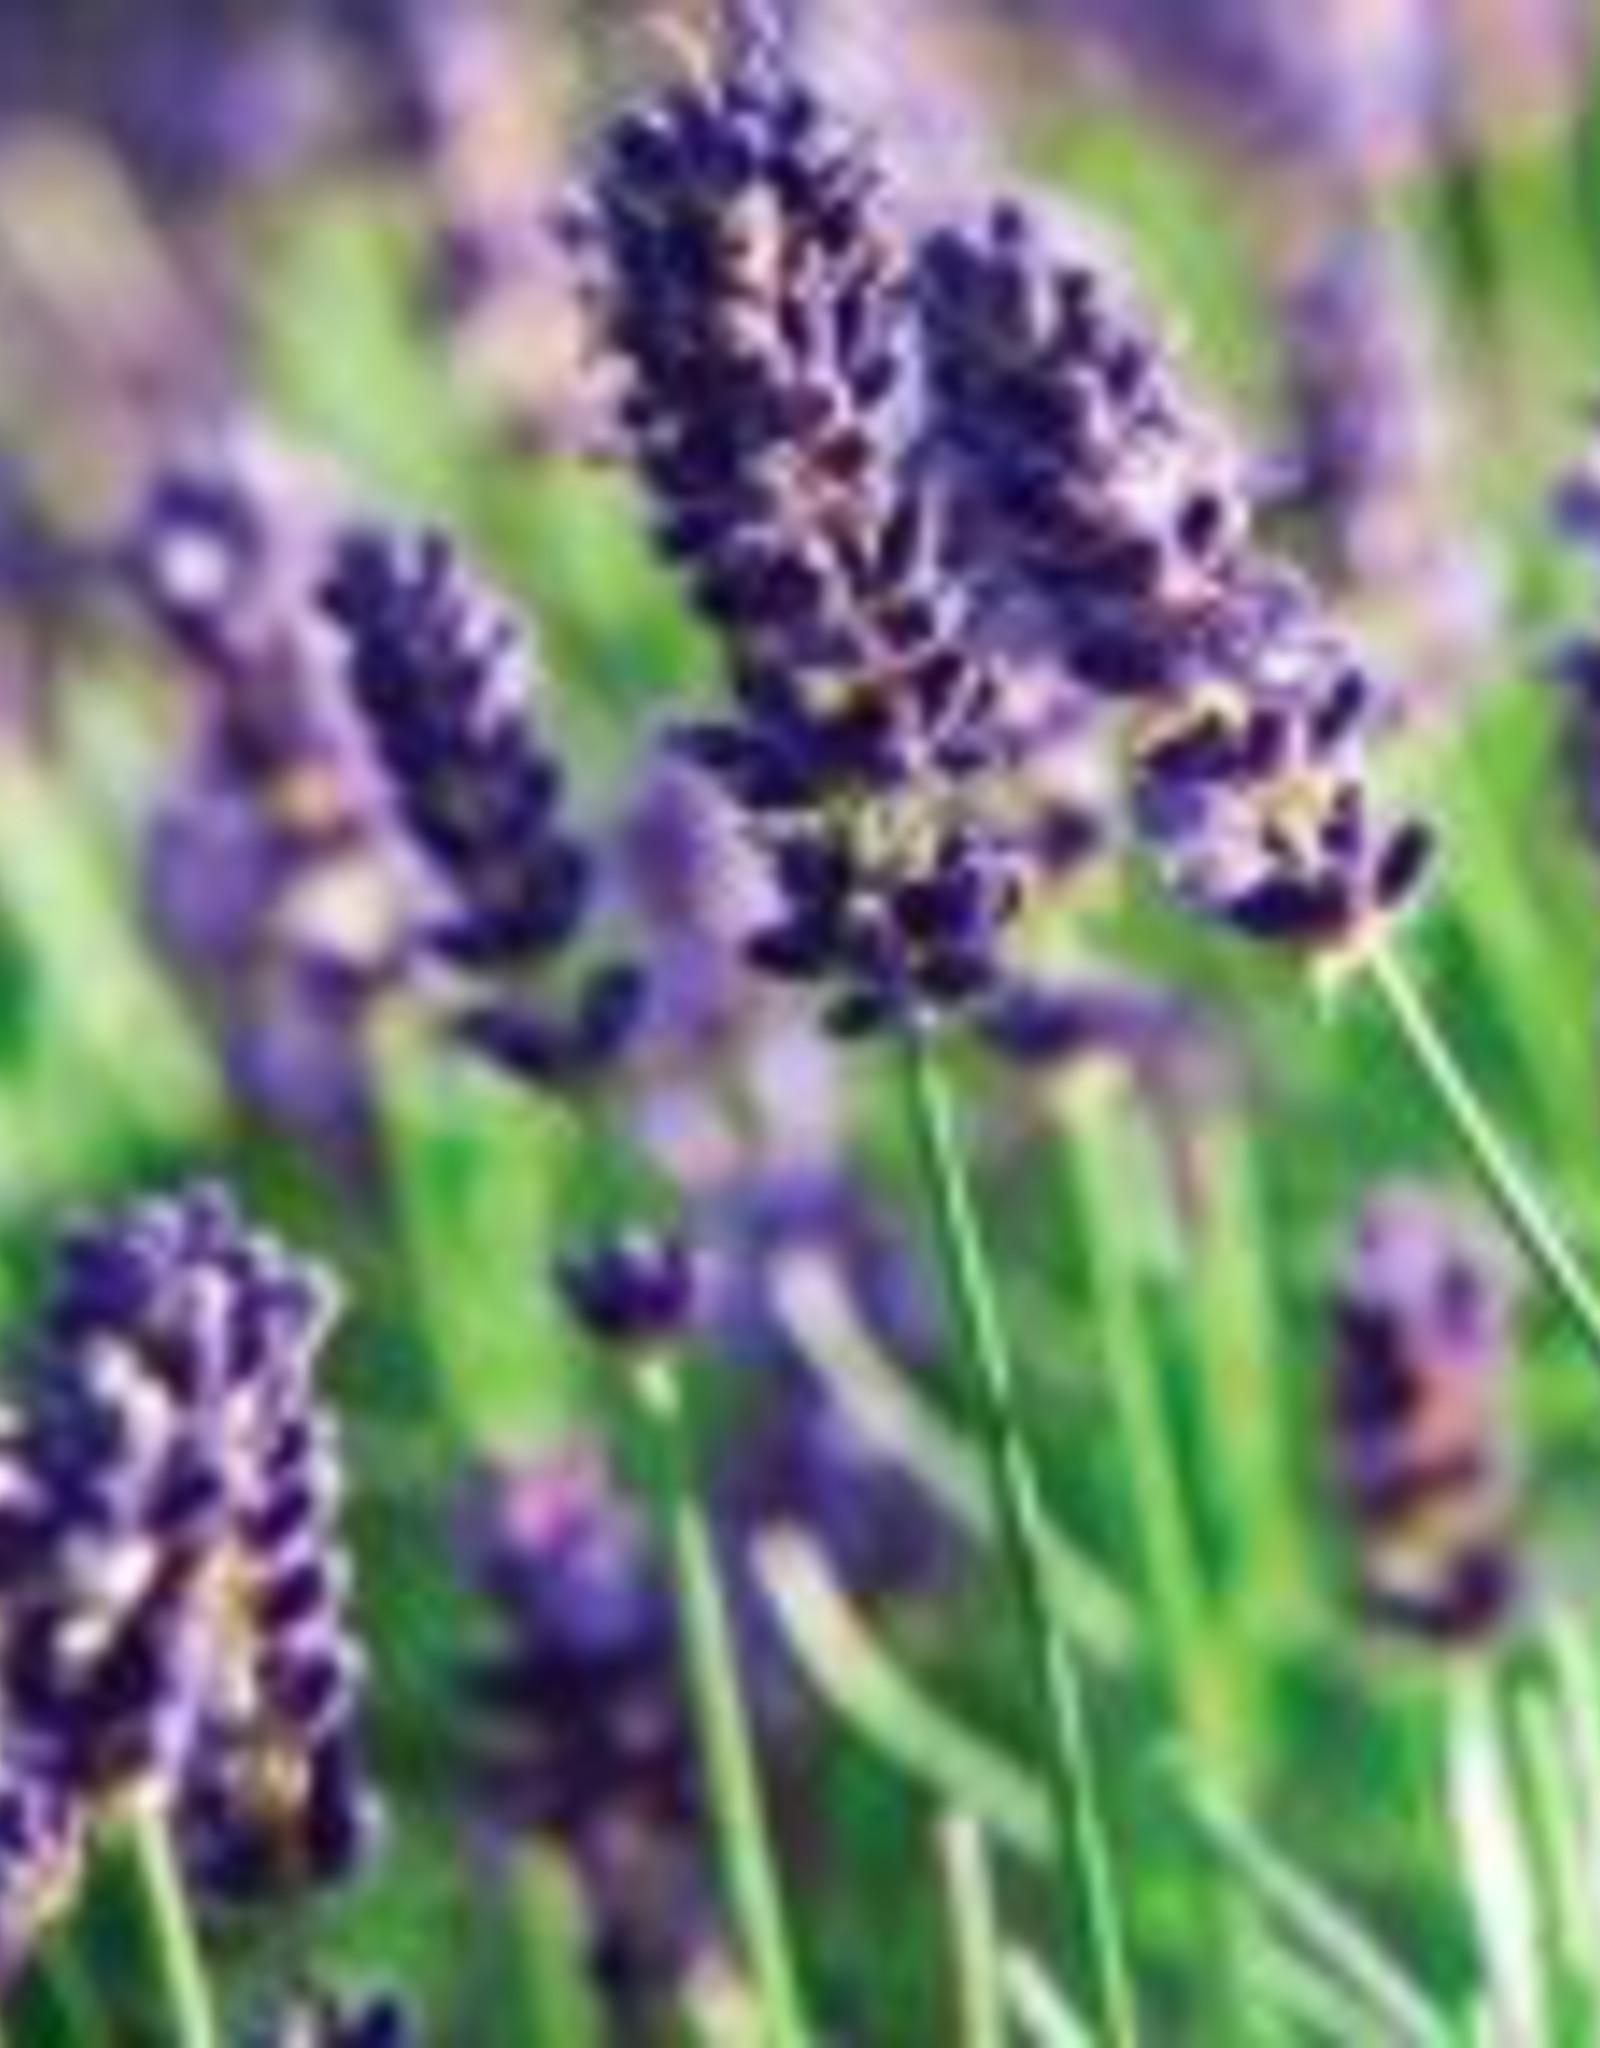 Utsukusy Lavendel hydrolaat toner lotion